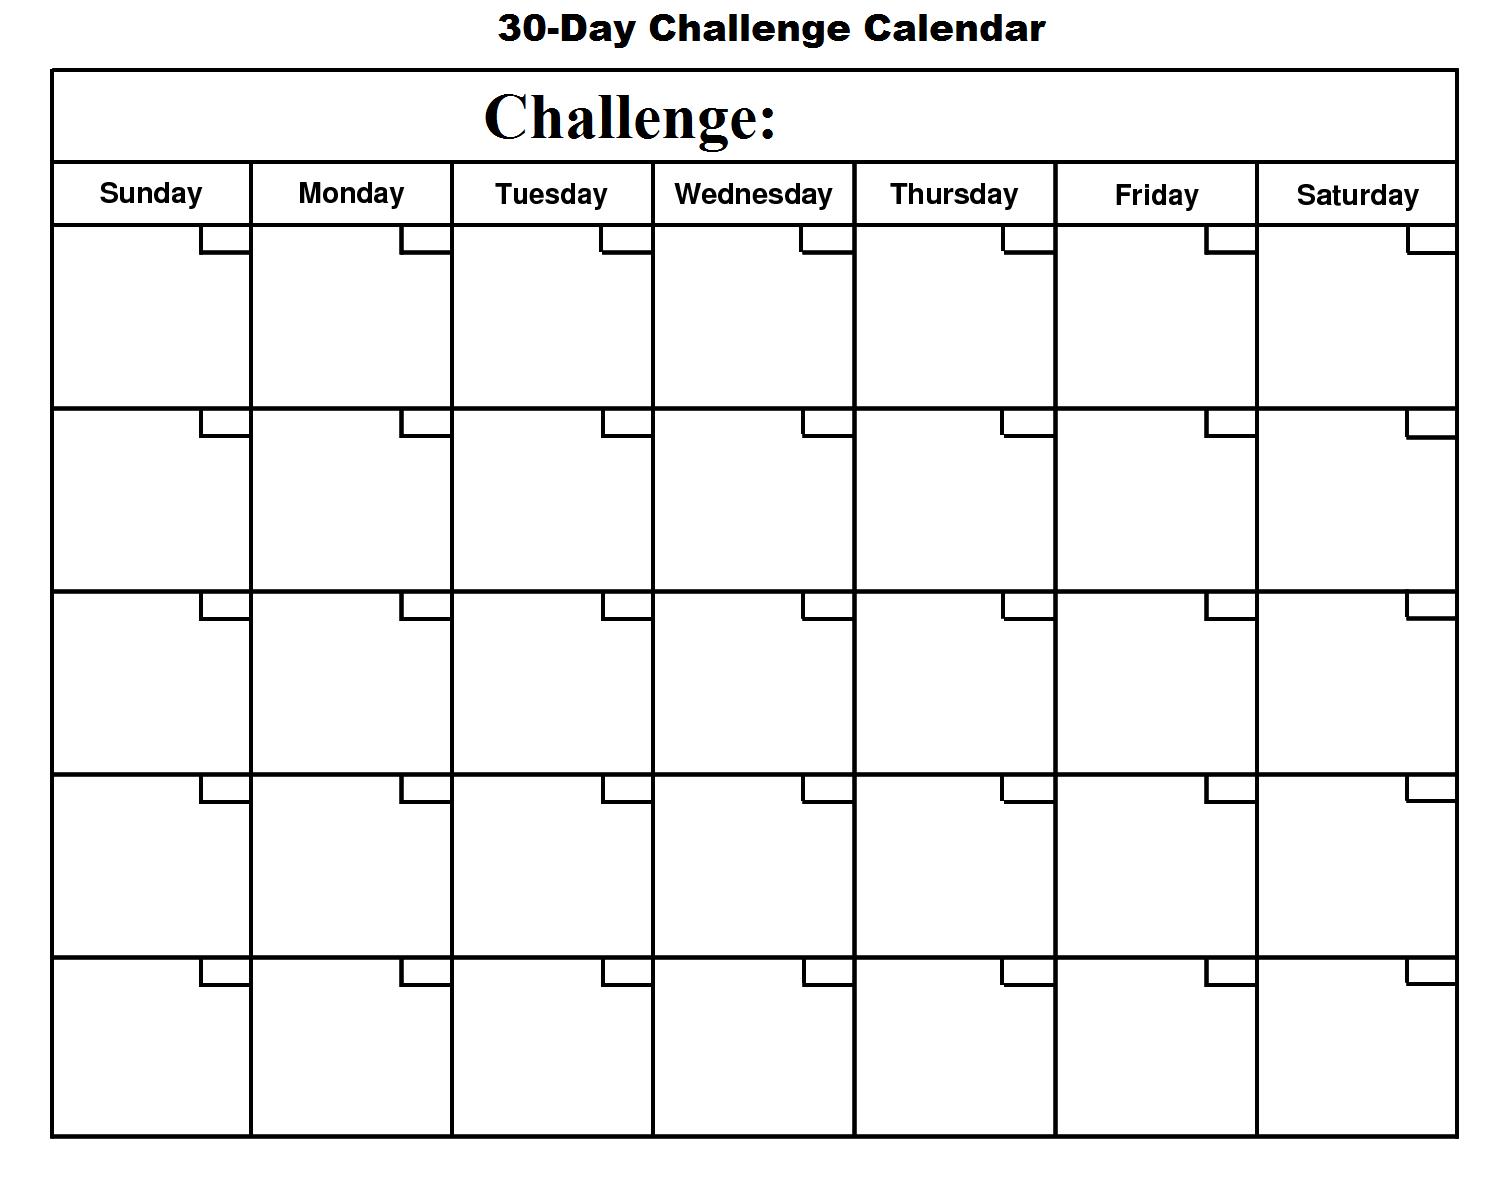 Changing Habits Calendar To Do Pinterest - Publication schedule template